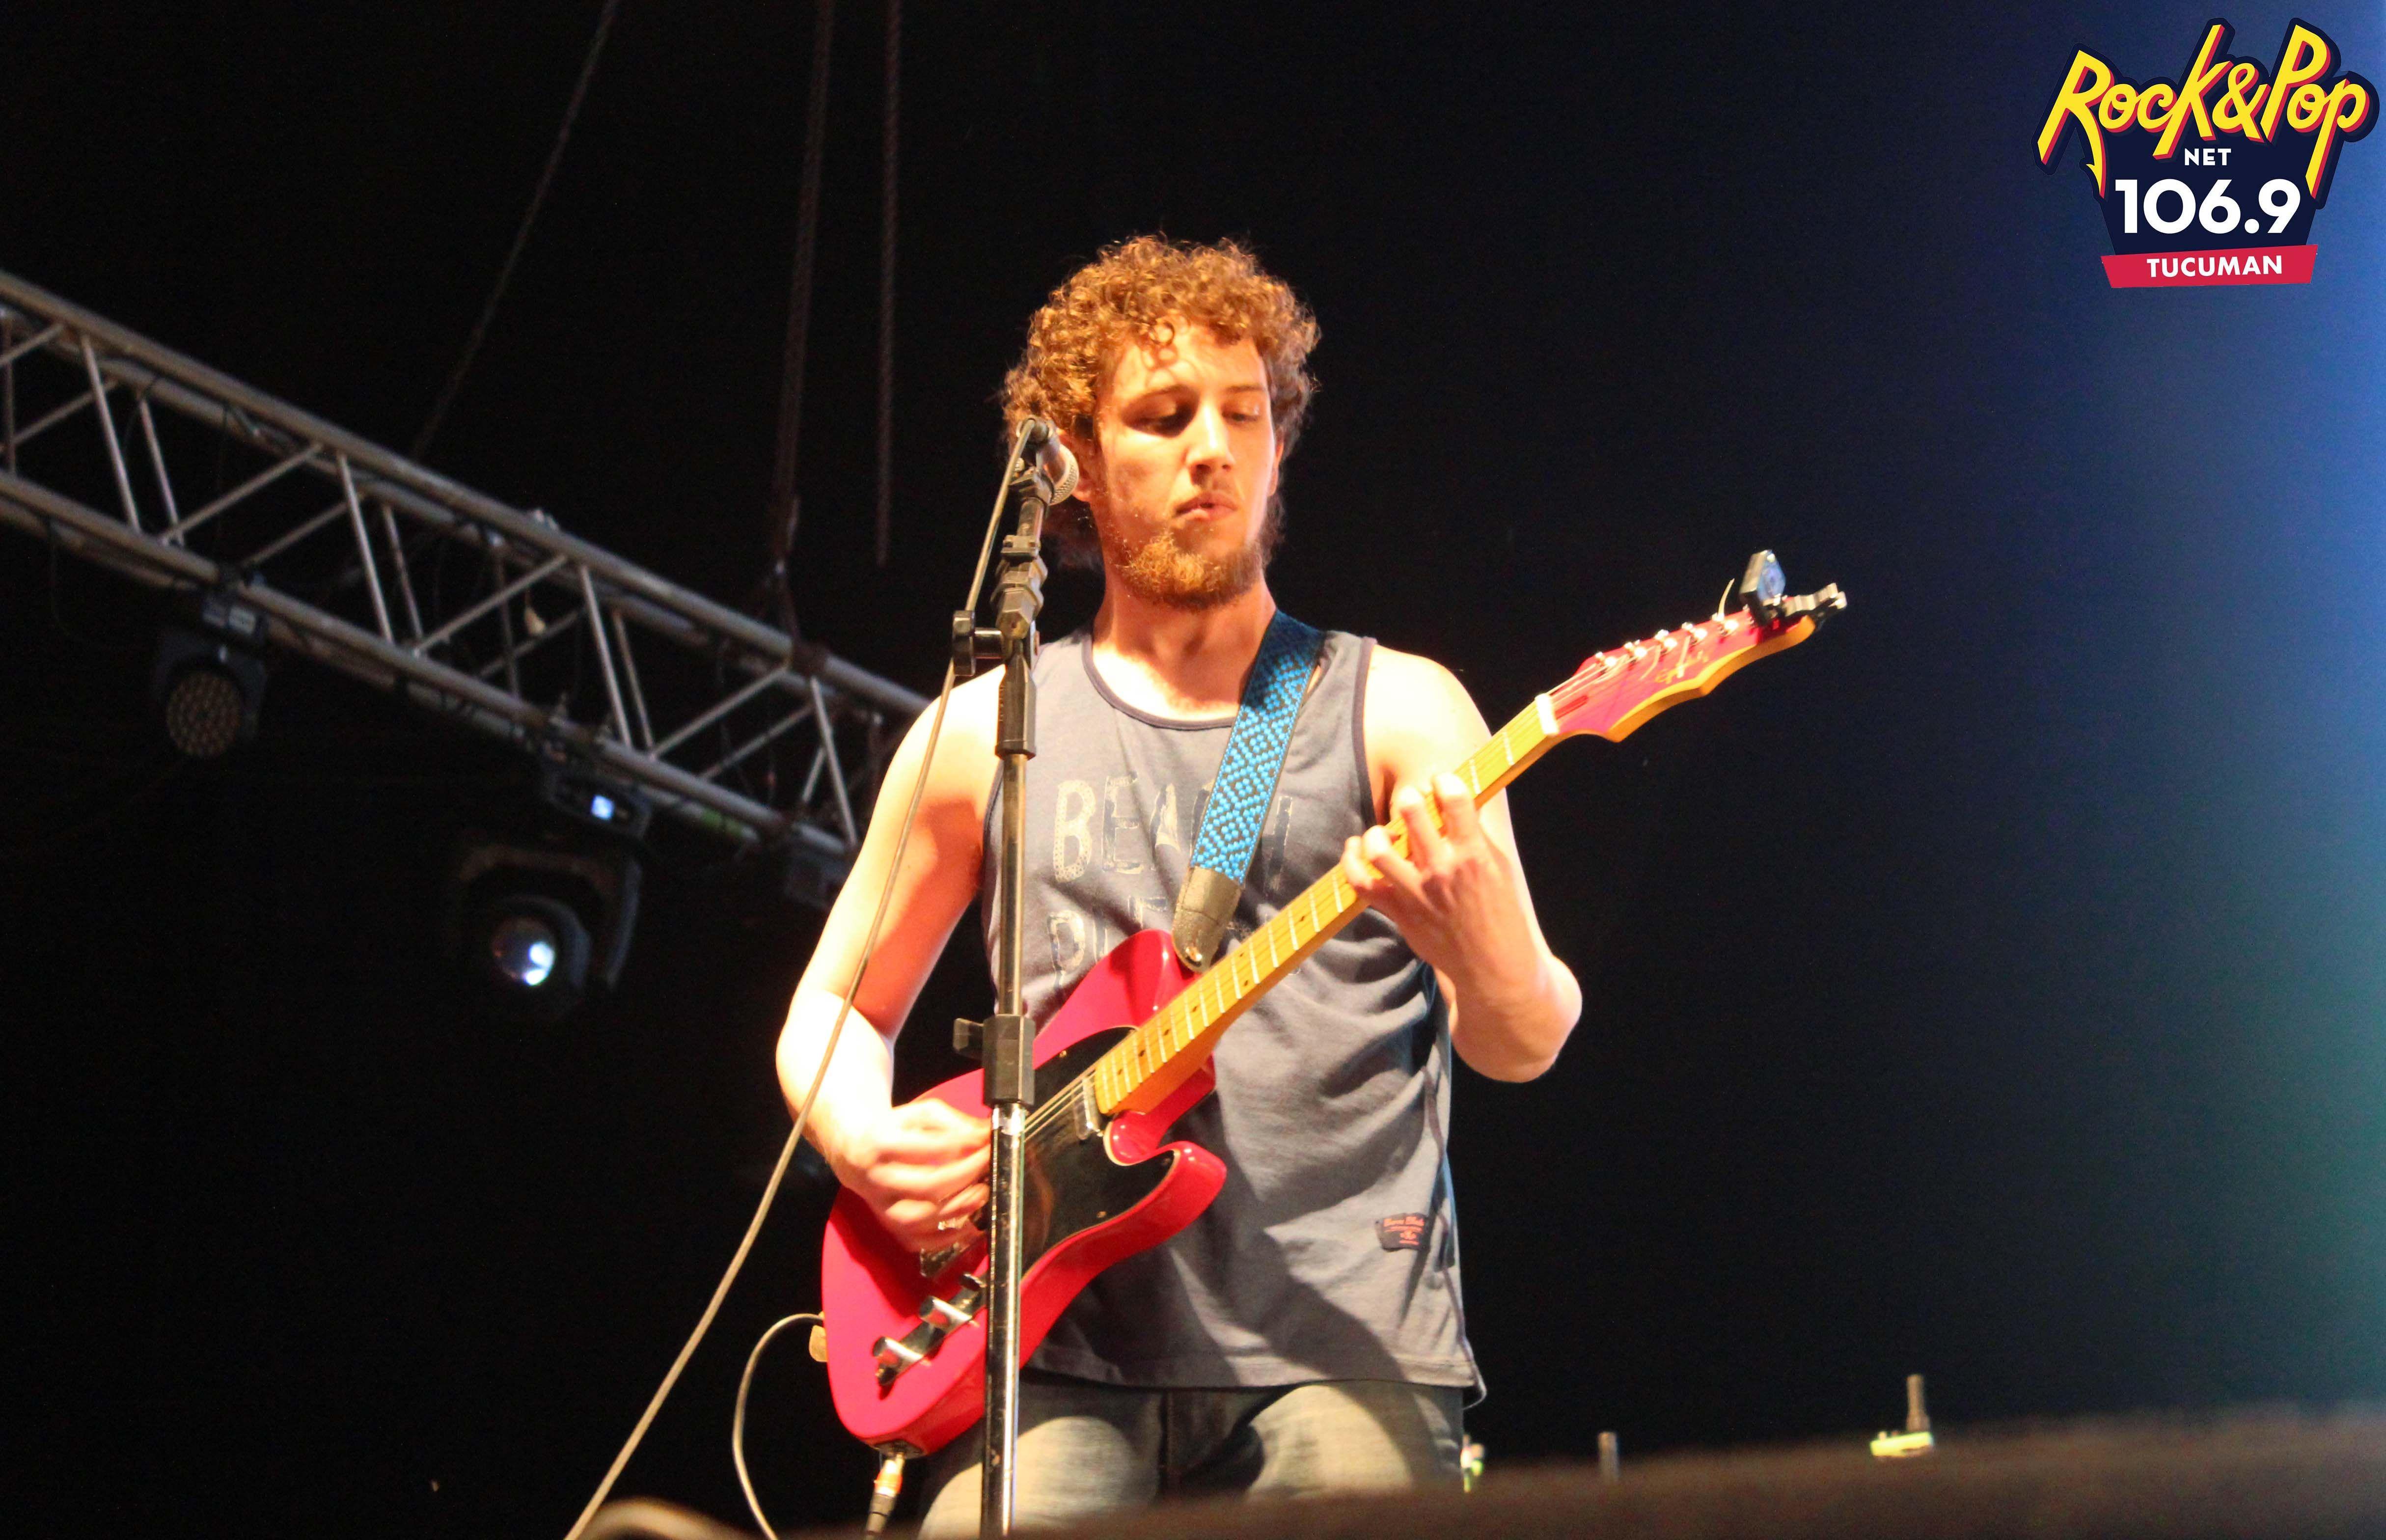 Yosef (Guitarrista de la banda De Los Pies A La Cabeza). #TucumanFest 2015